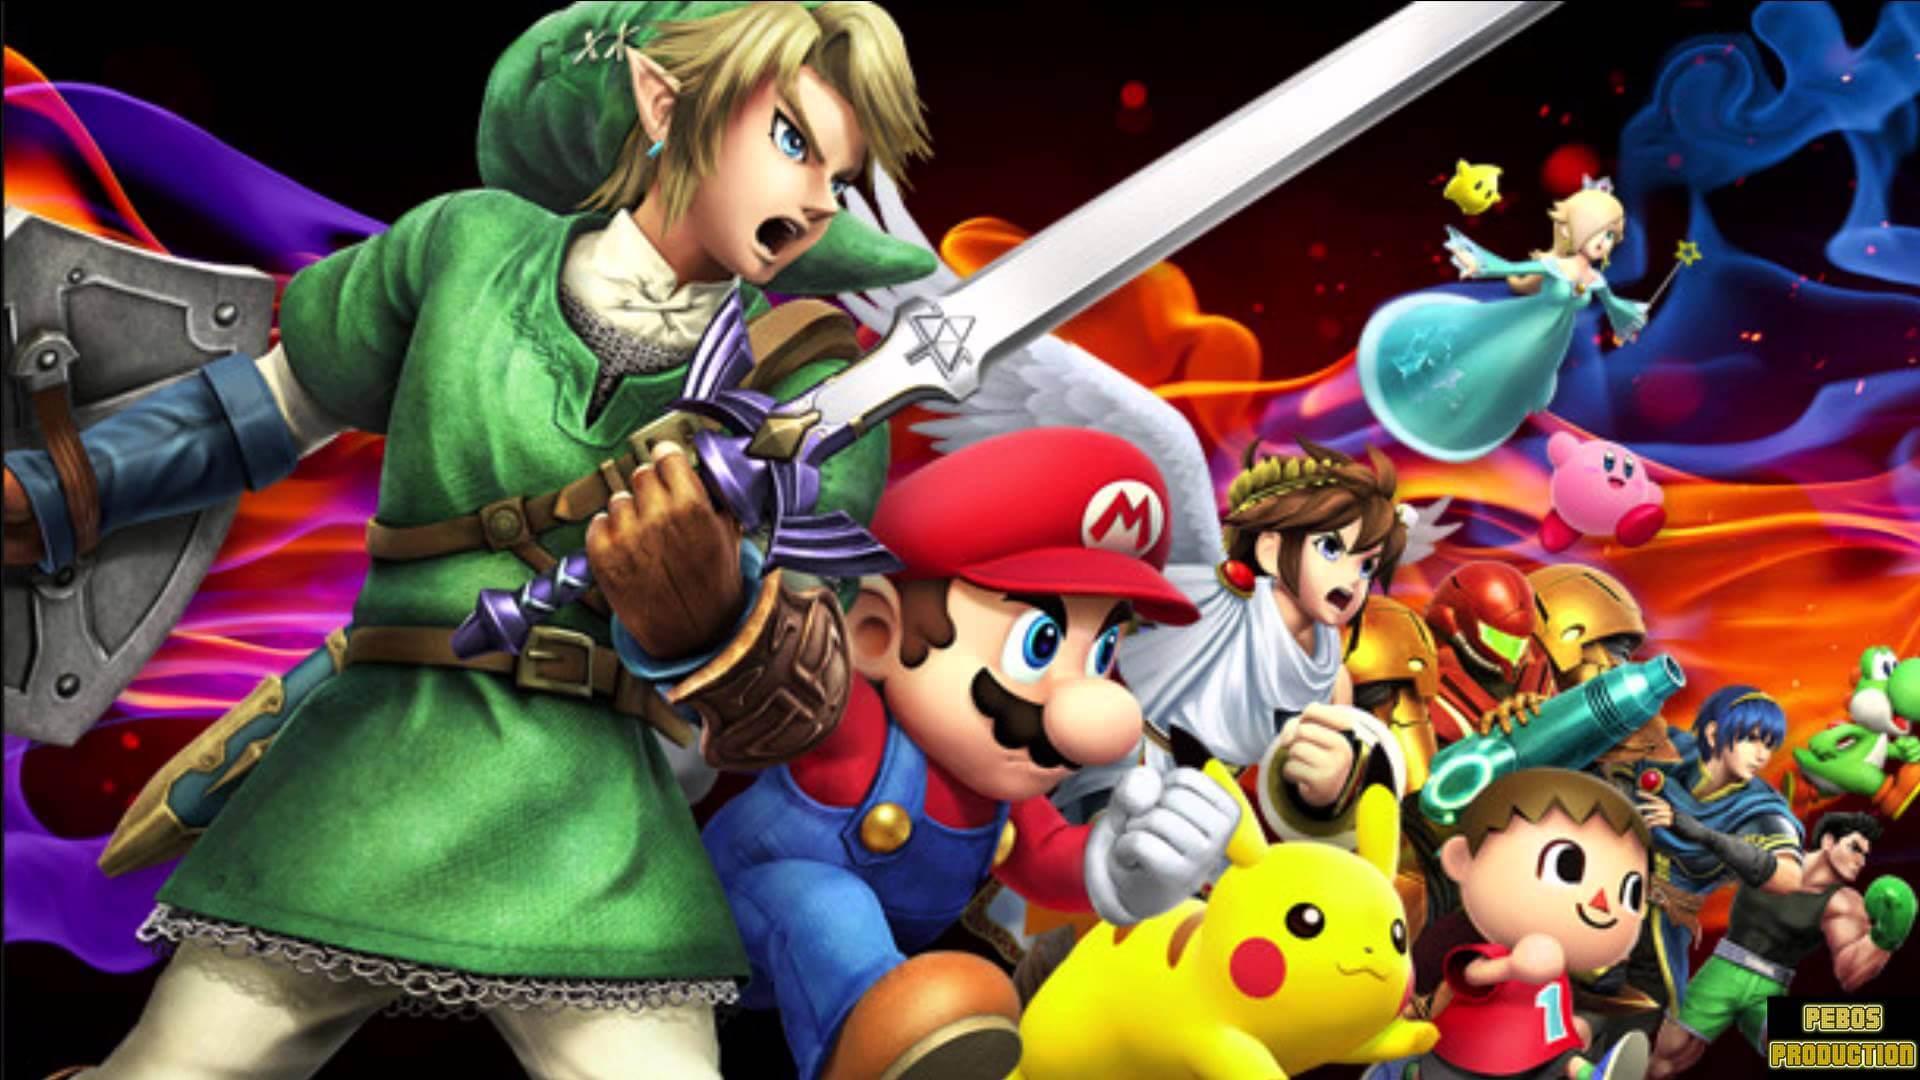 Rumor: Super Smash Bros Set for Nintendo NX Release?